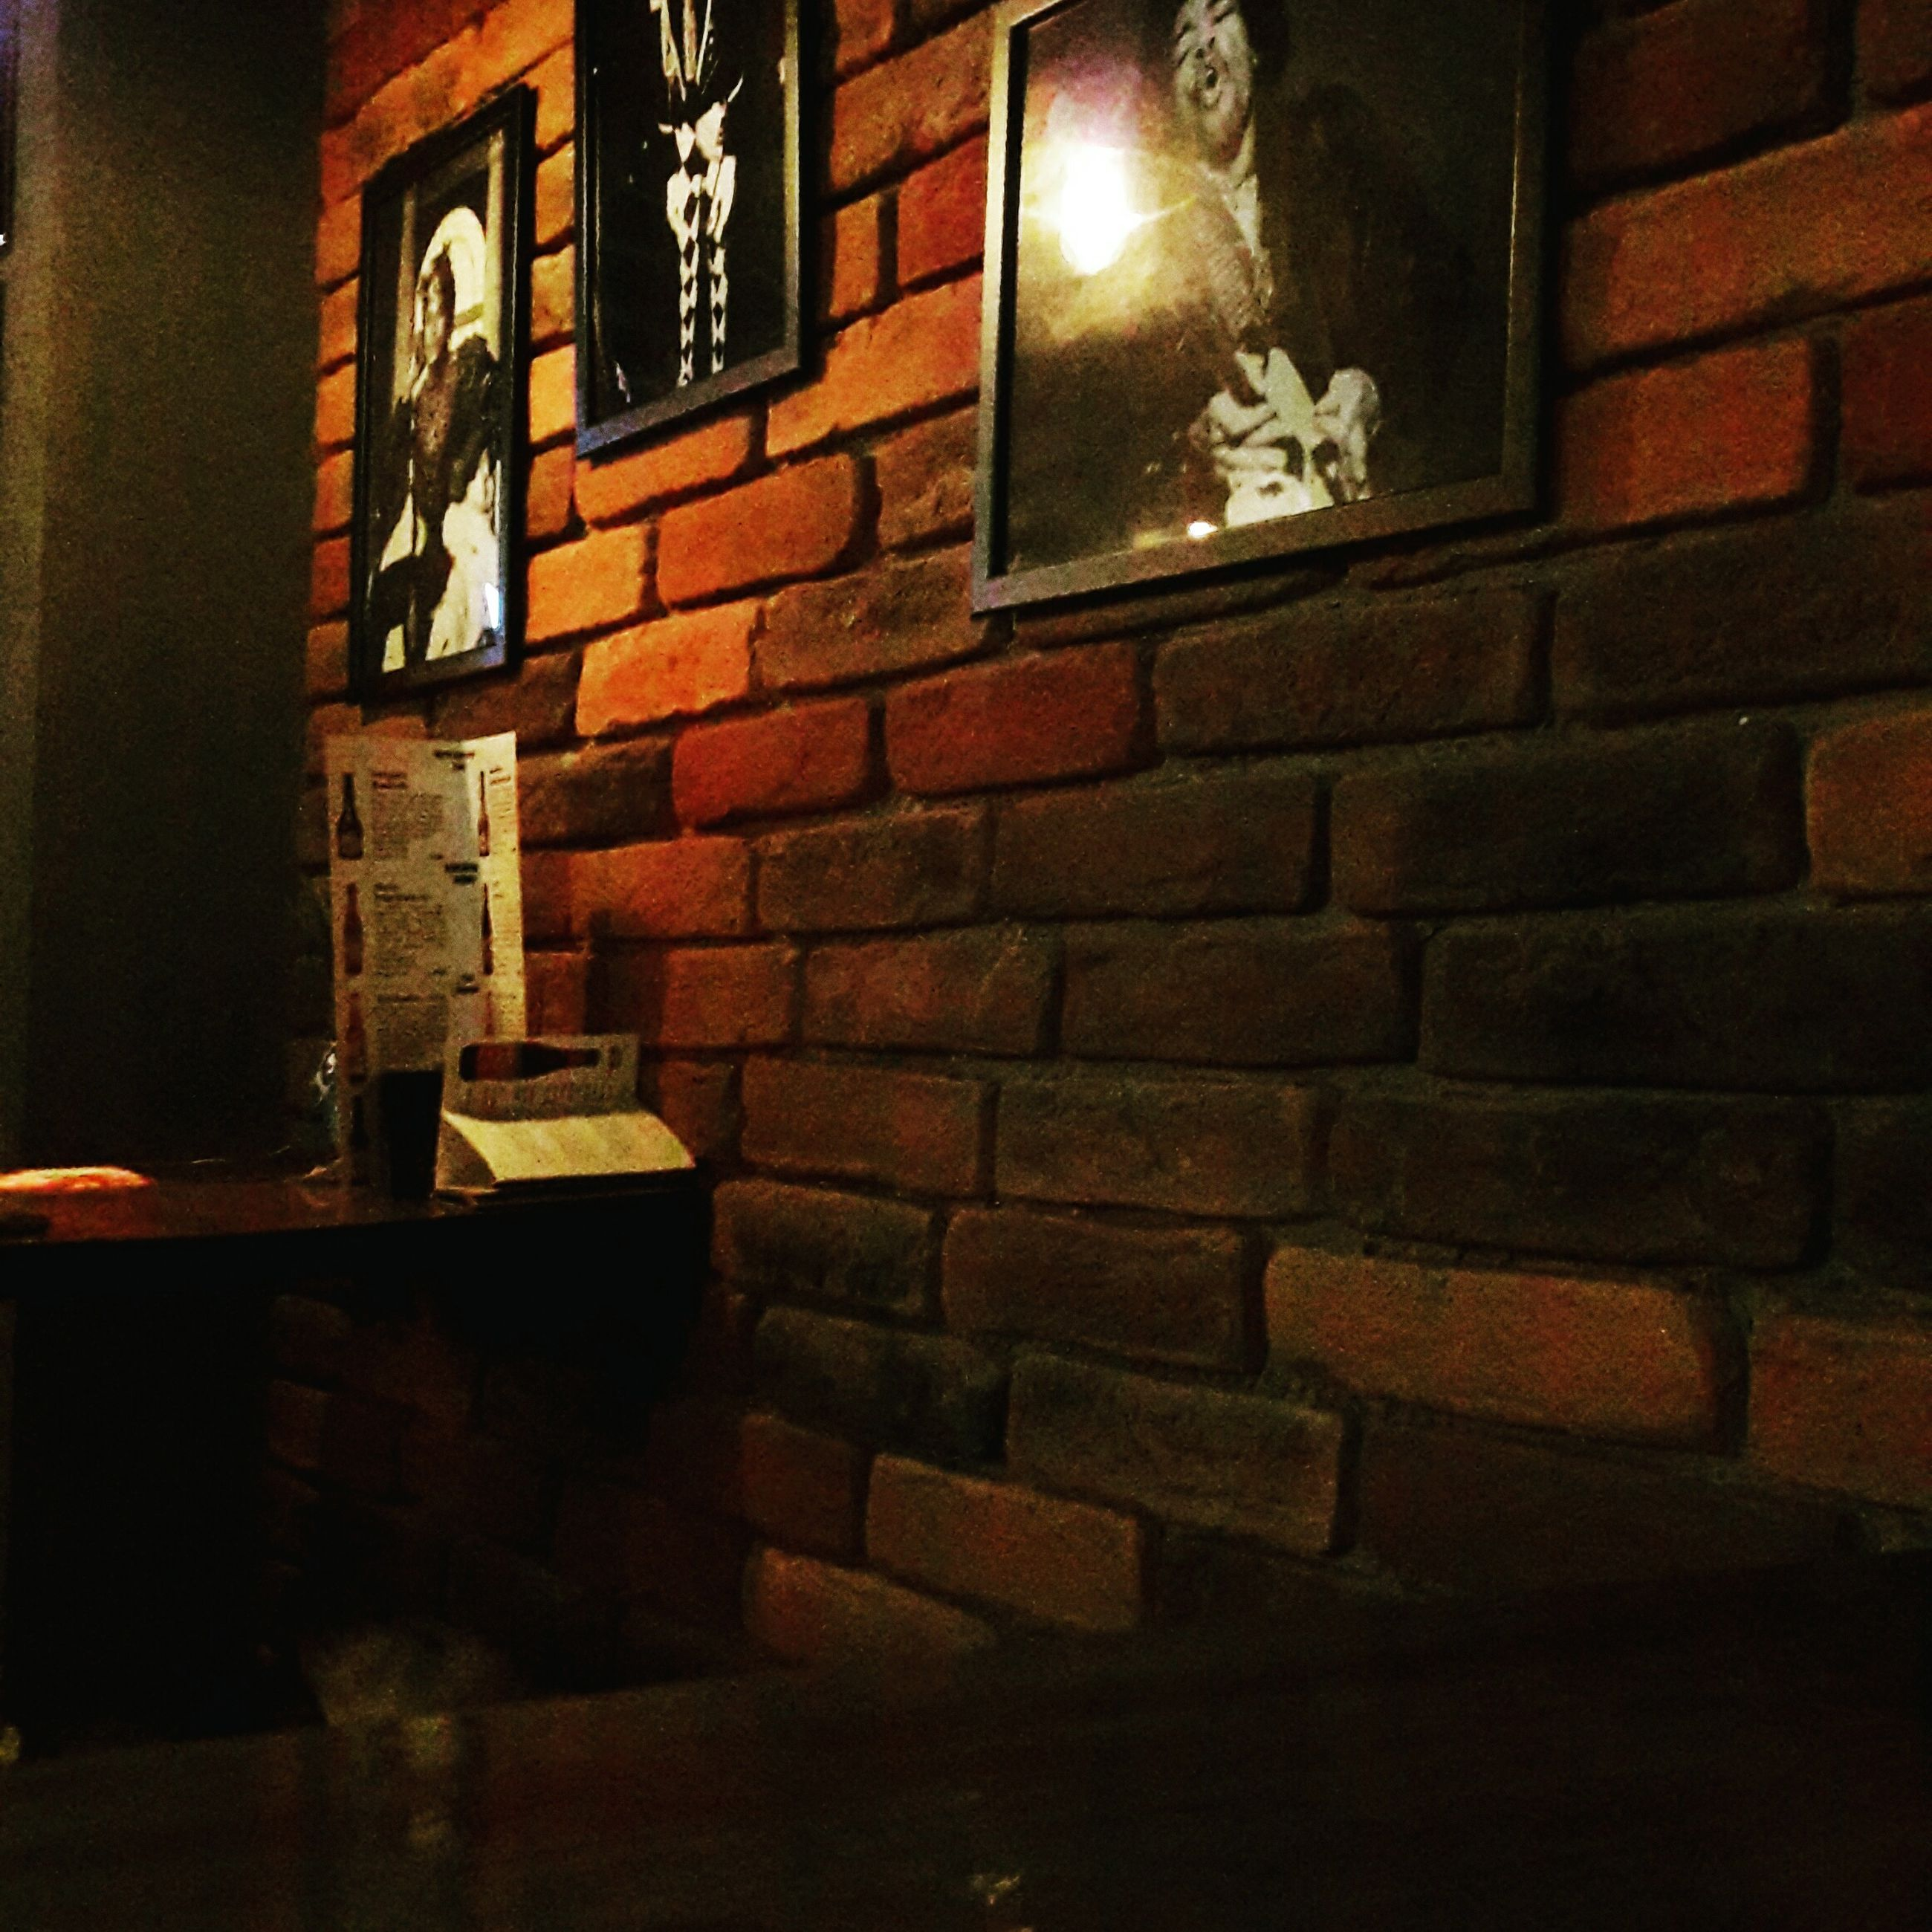 illuminated, brick wall, night, indoors, architecture, no people